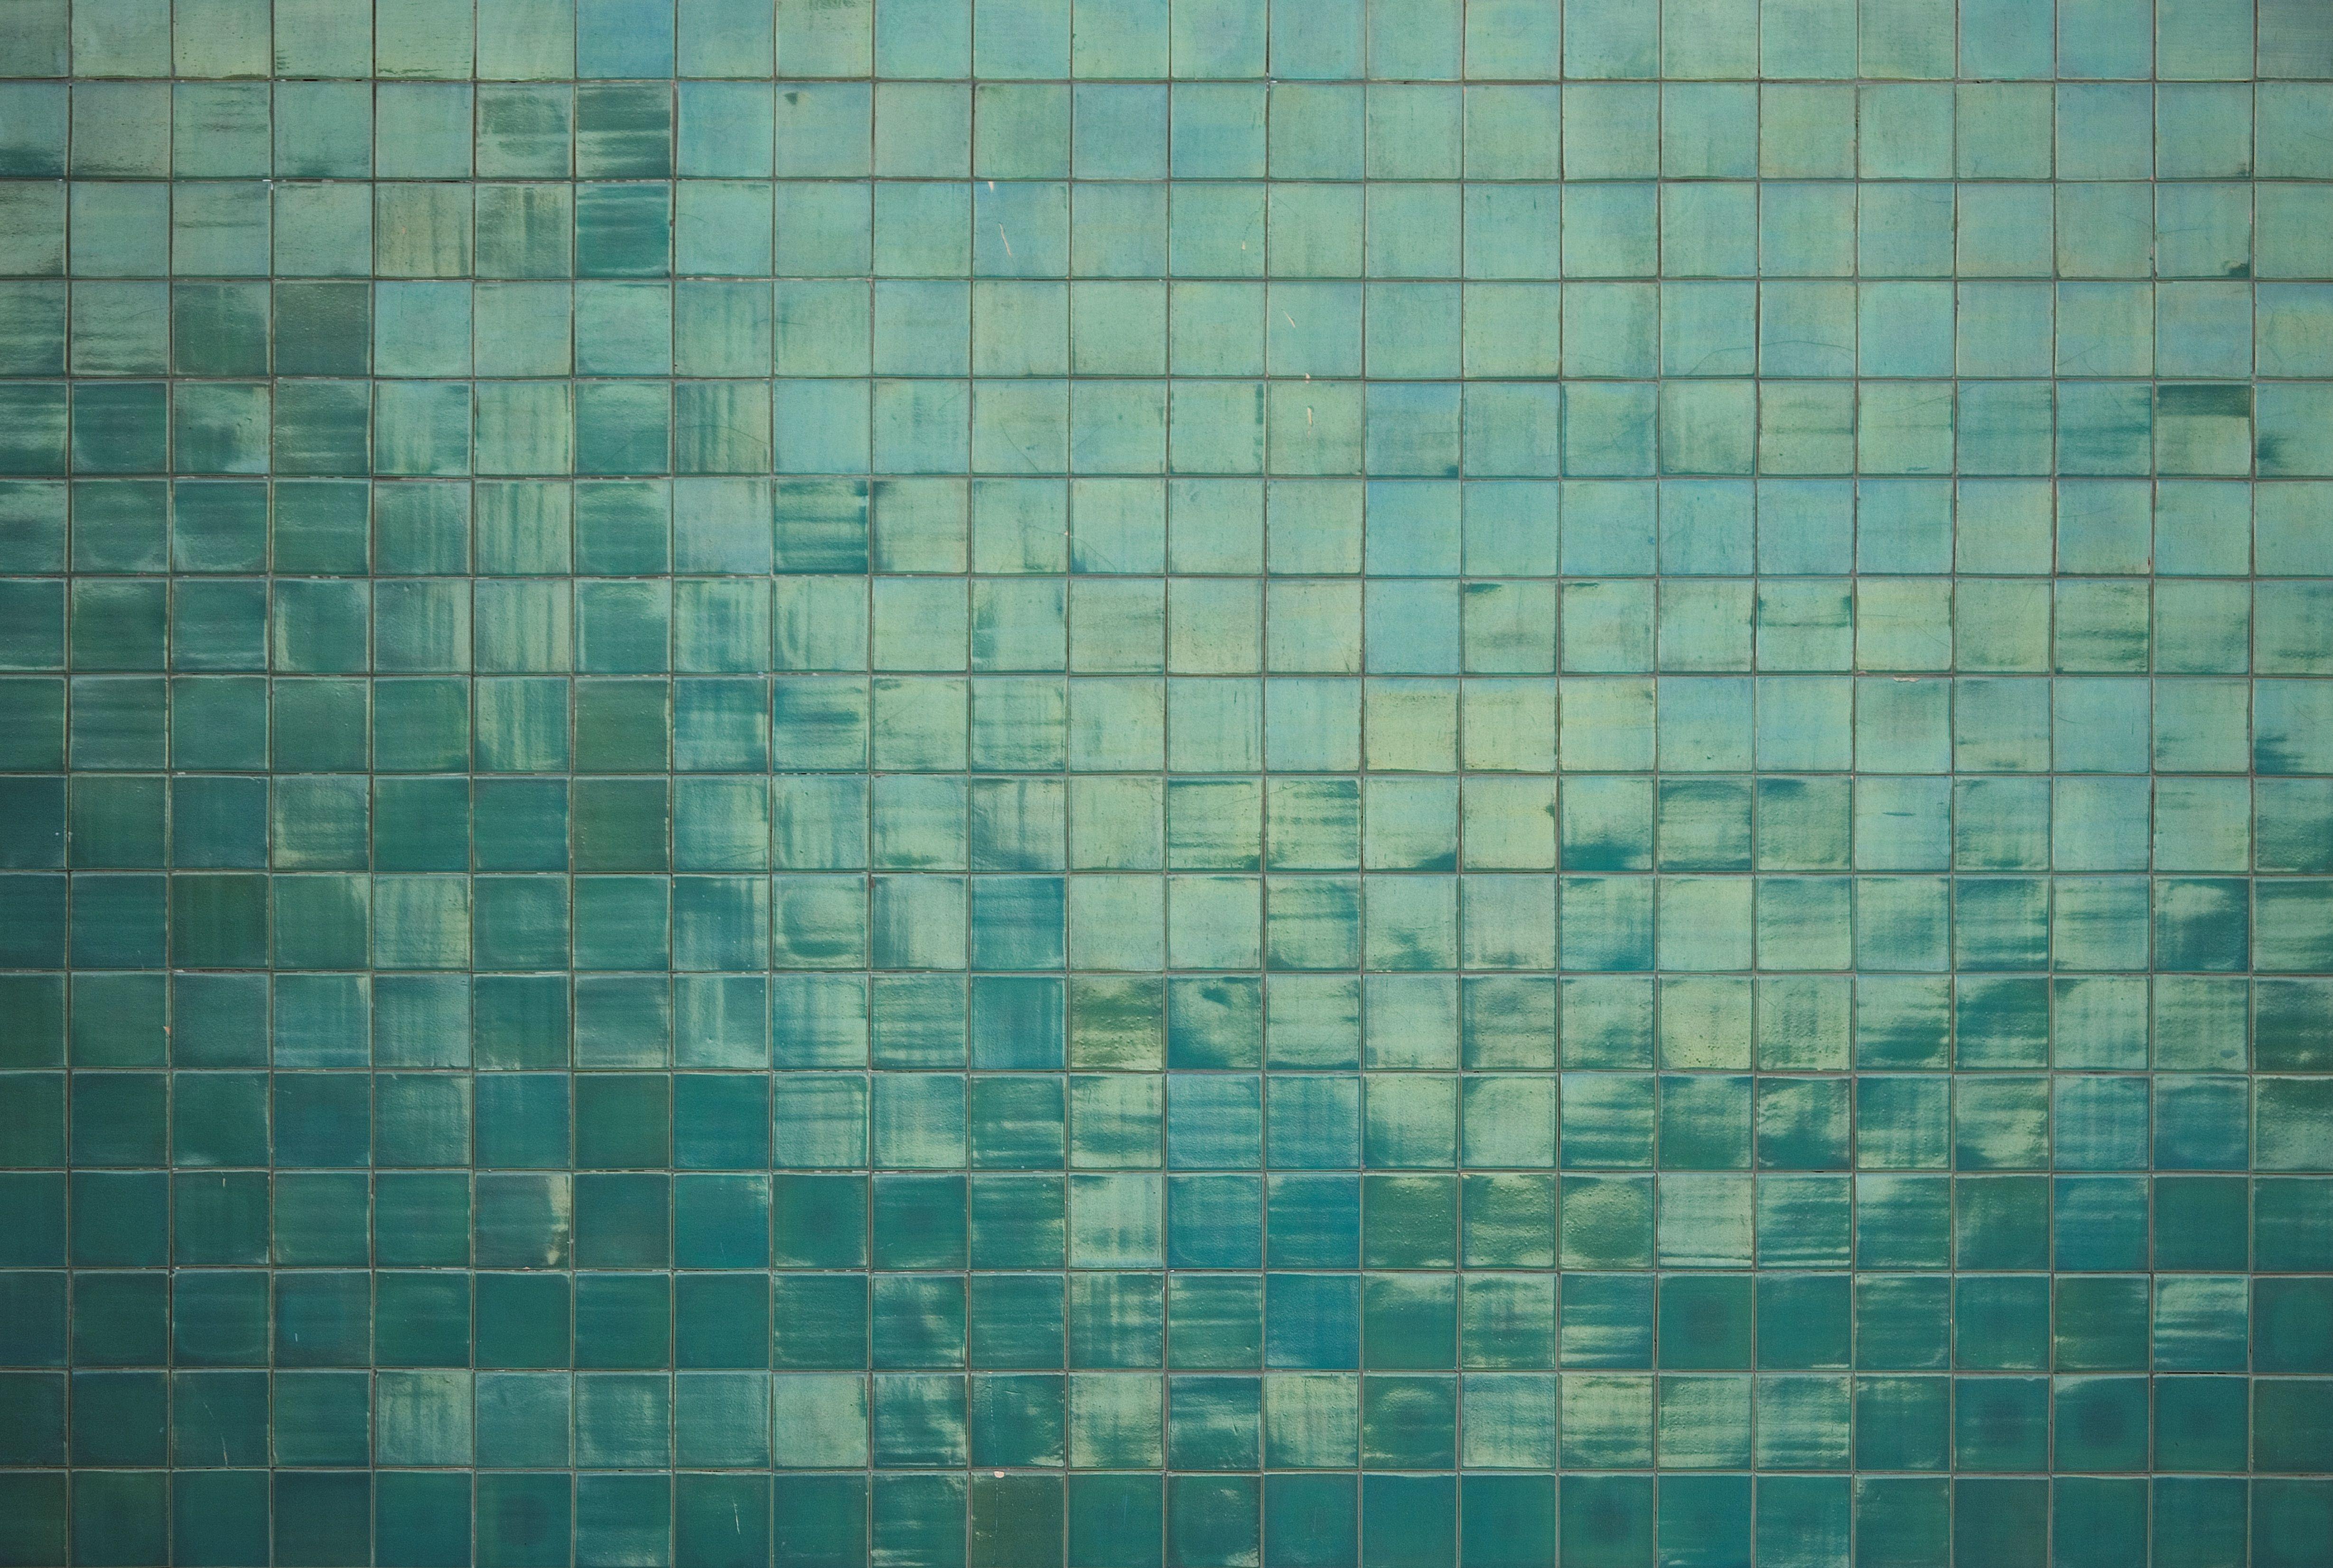 VL_Handglazed Azulejos Verde Expo 14x14 | ceramic tiles | Pinterest